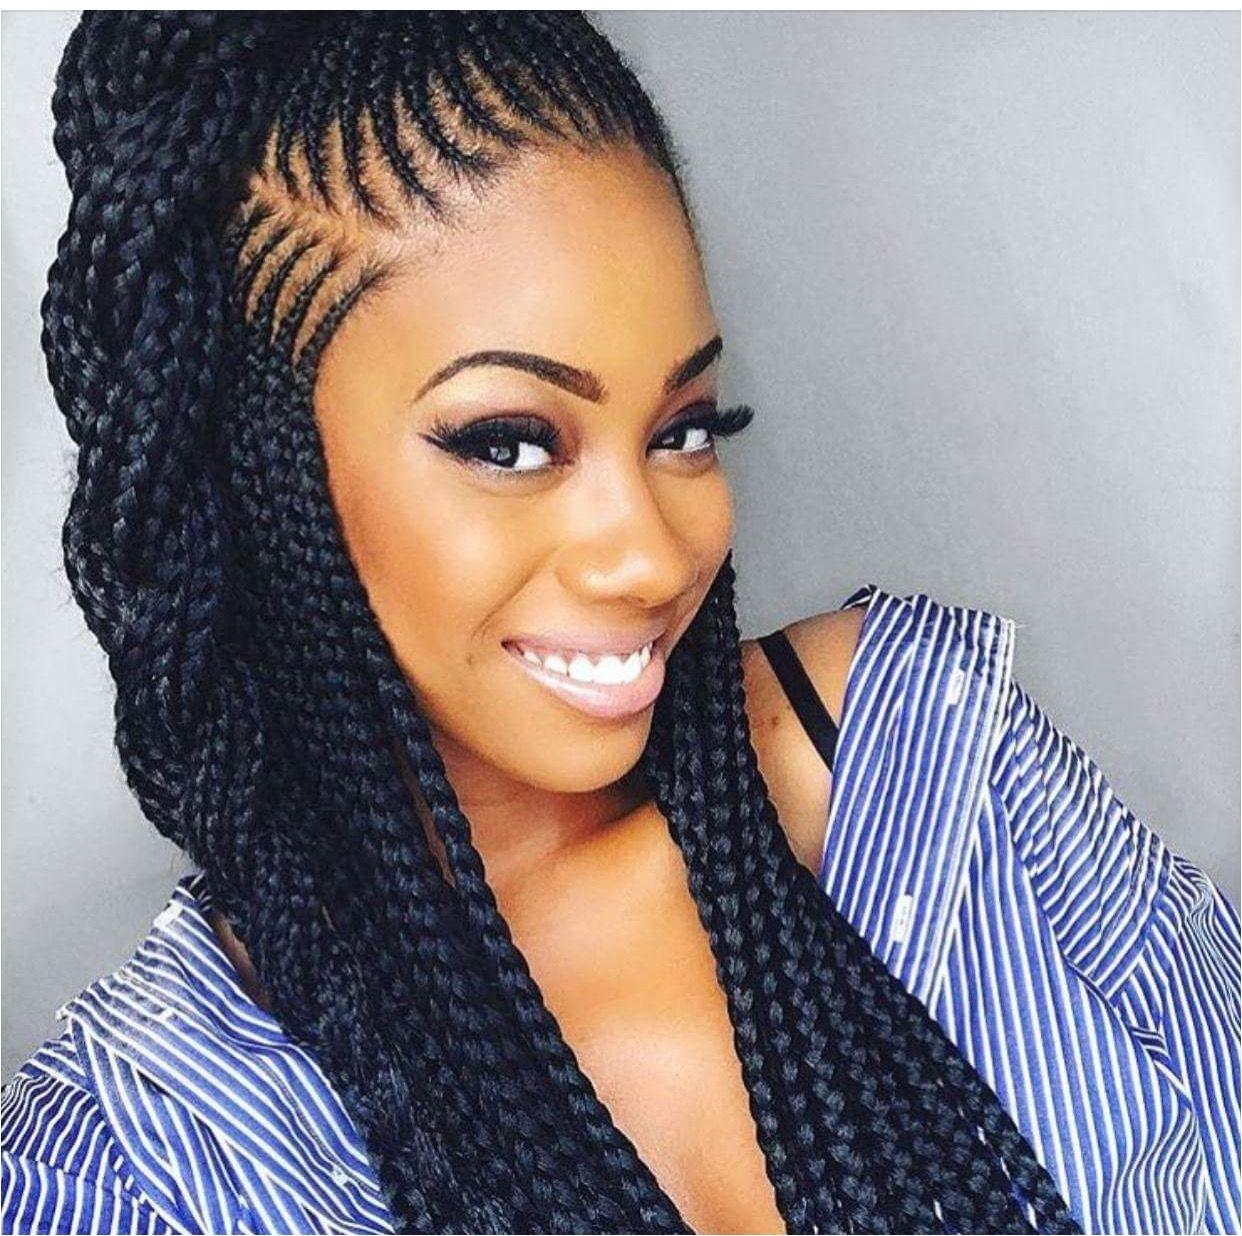 African Braids Hairstyles Nice Hairstyles Black Girls Hairstyles Female Hairstyles Hairstyles 2018